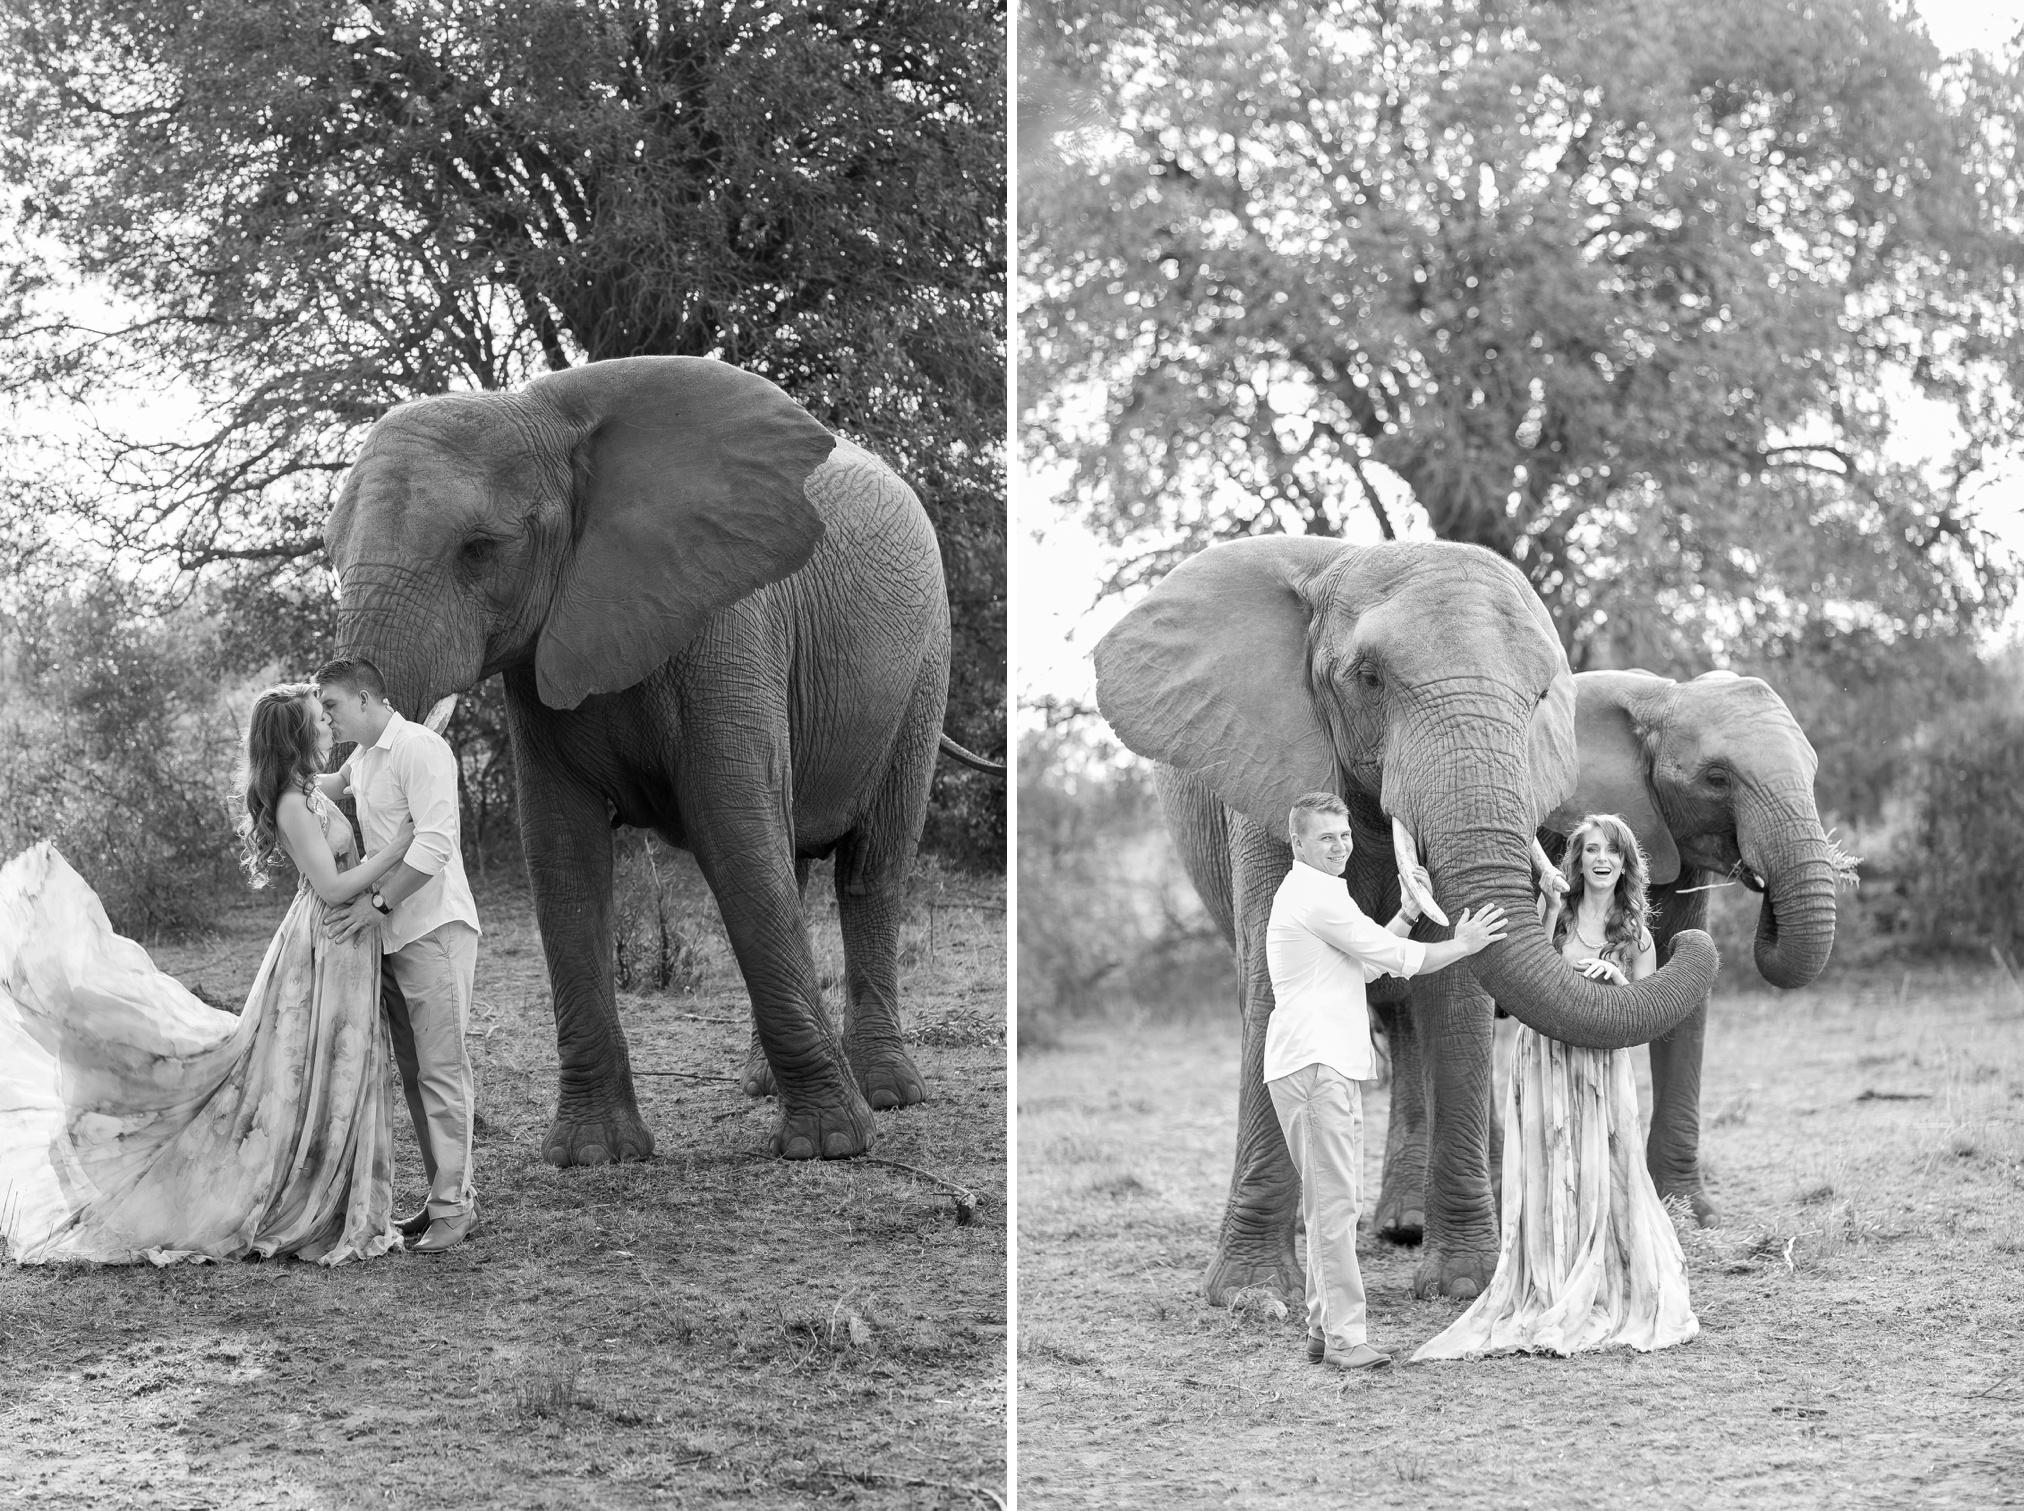 Glen_Afric_Kyle_and_Lindsay_engagement_elephants_safari_9